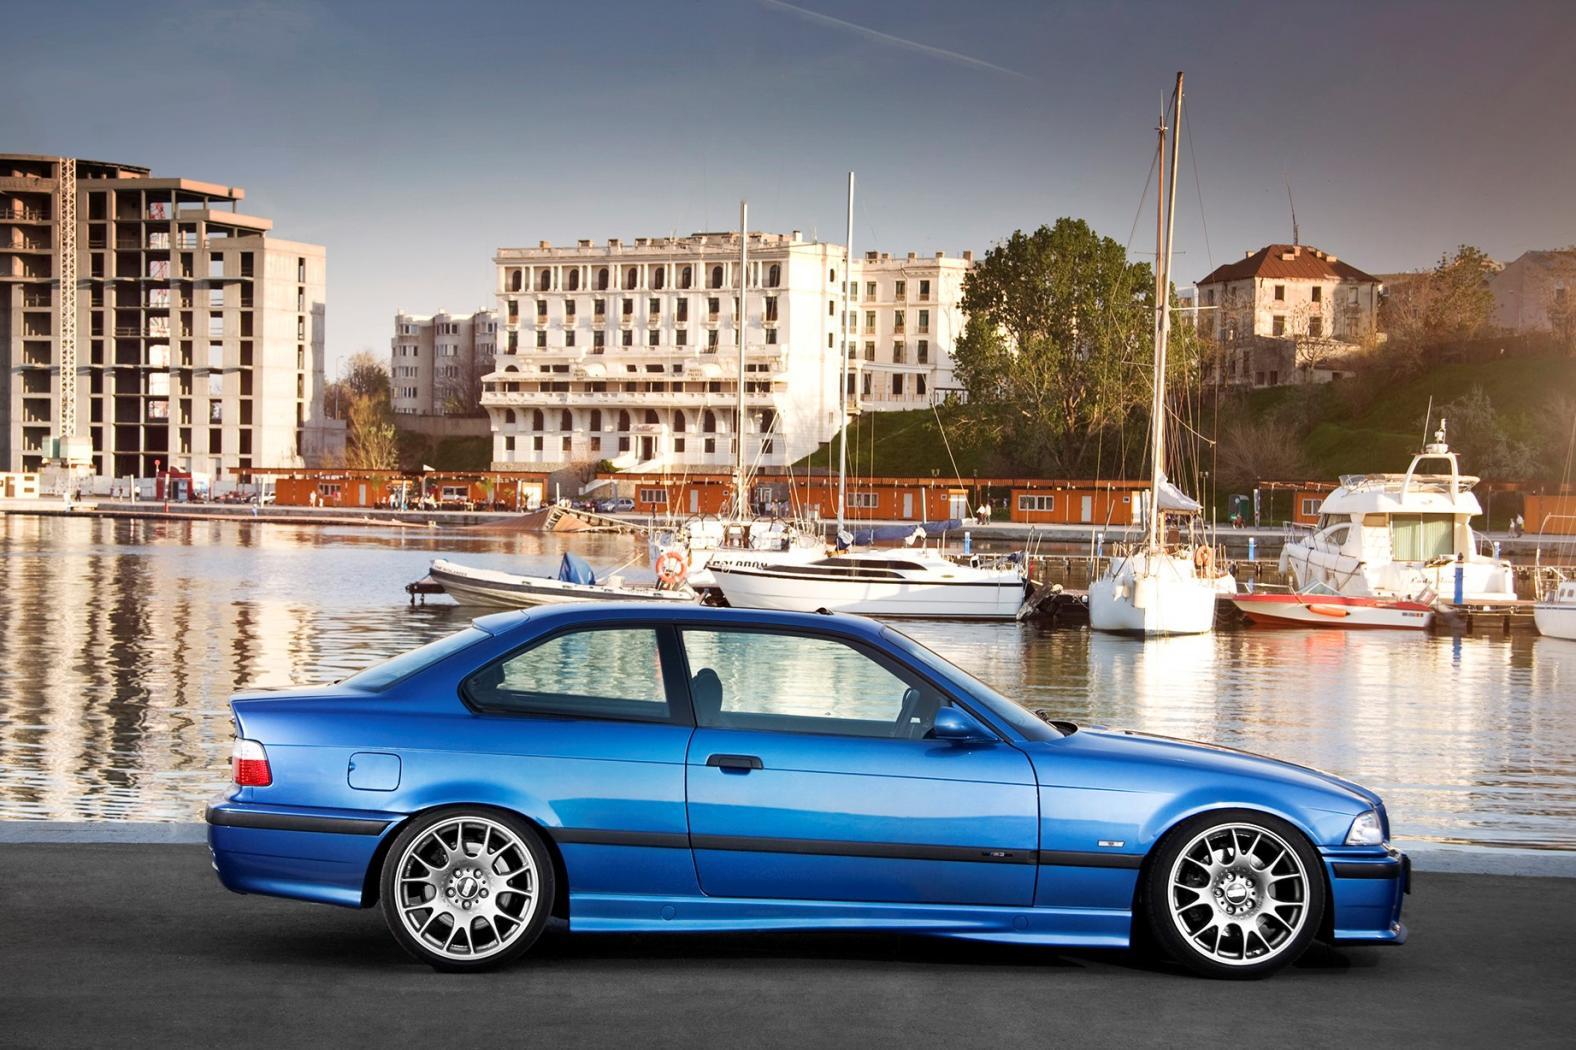 BMW-M3-E36_20170612-1514.jpeg